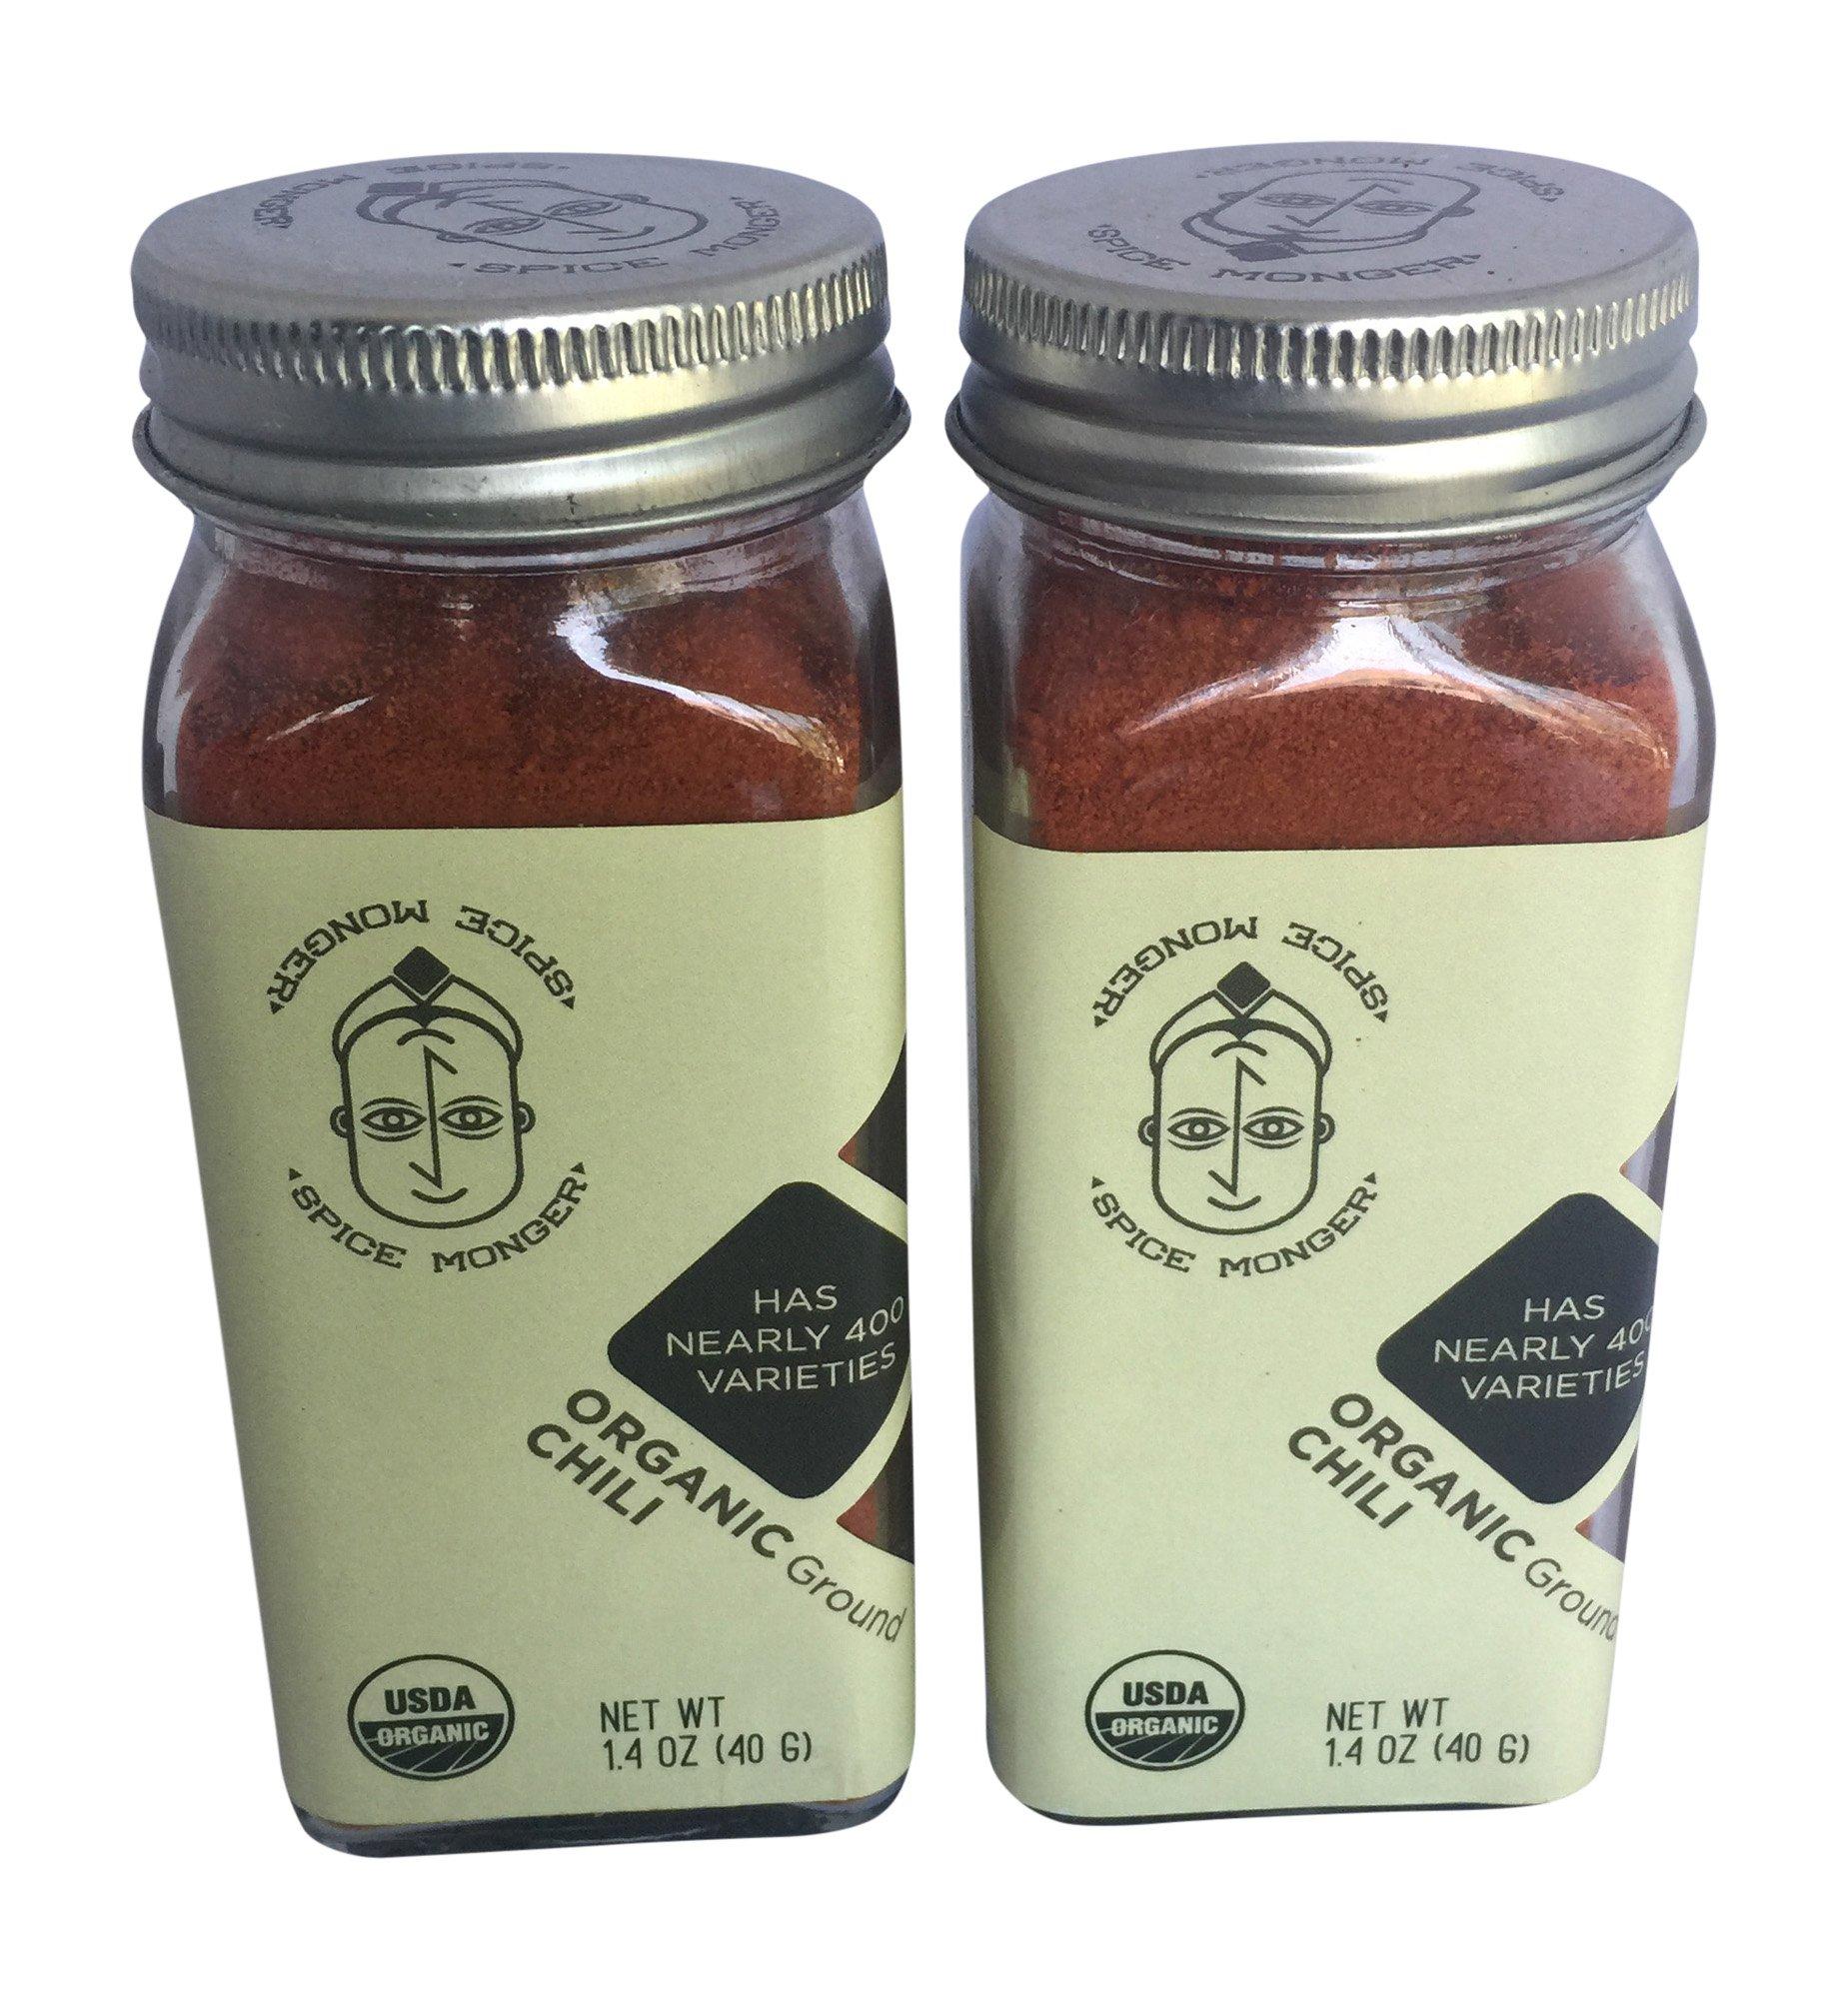 Spice Monger Organic Chili Powder 1.4OZ (Pack of 2) USDA Certified, All Naturals fresh from Malabar coast, Kosher certified